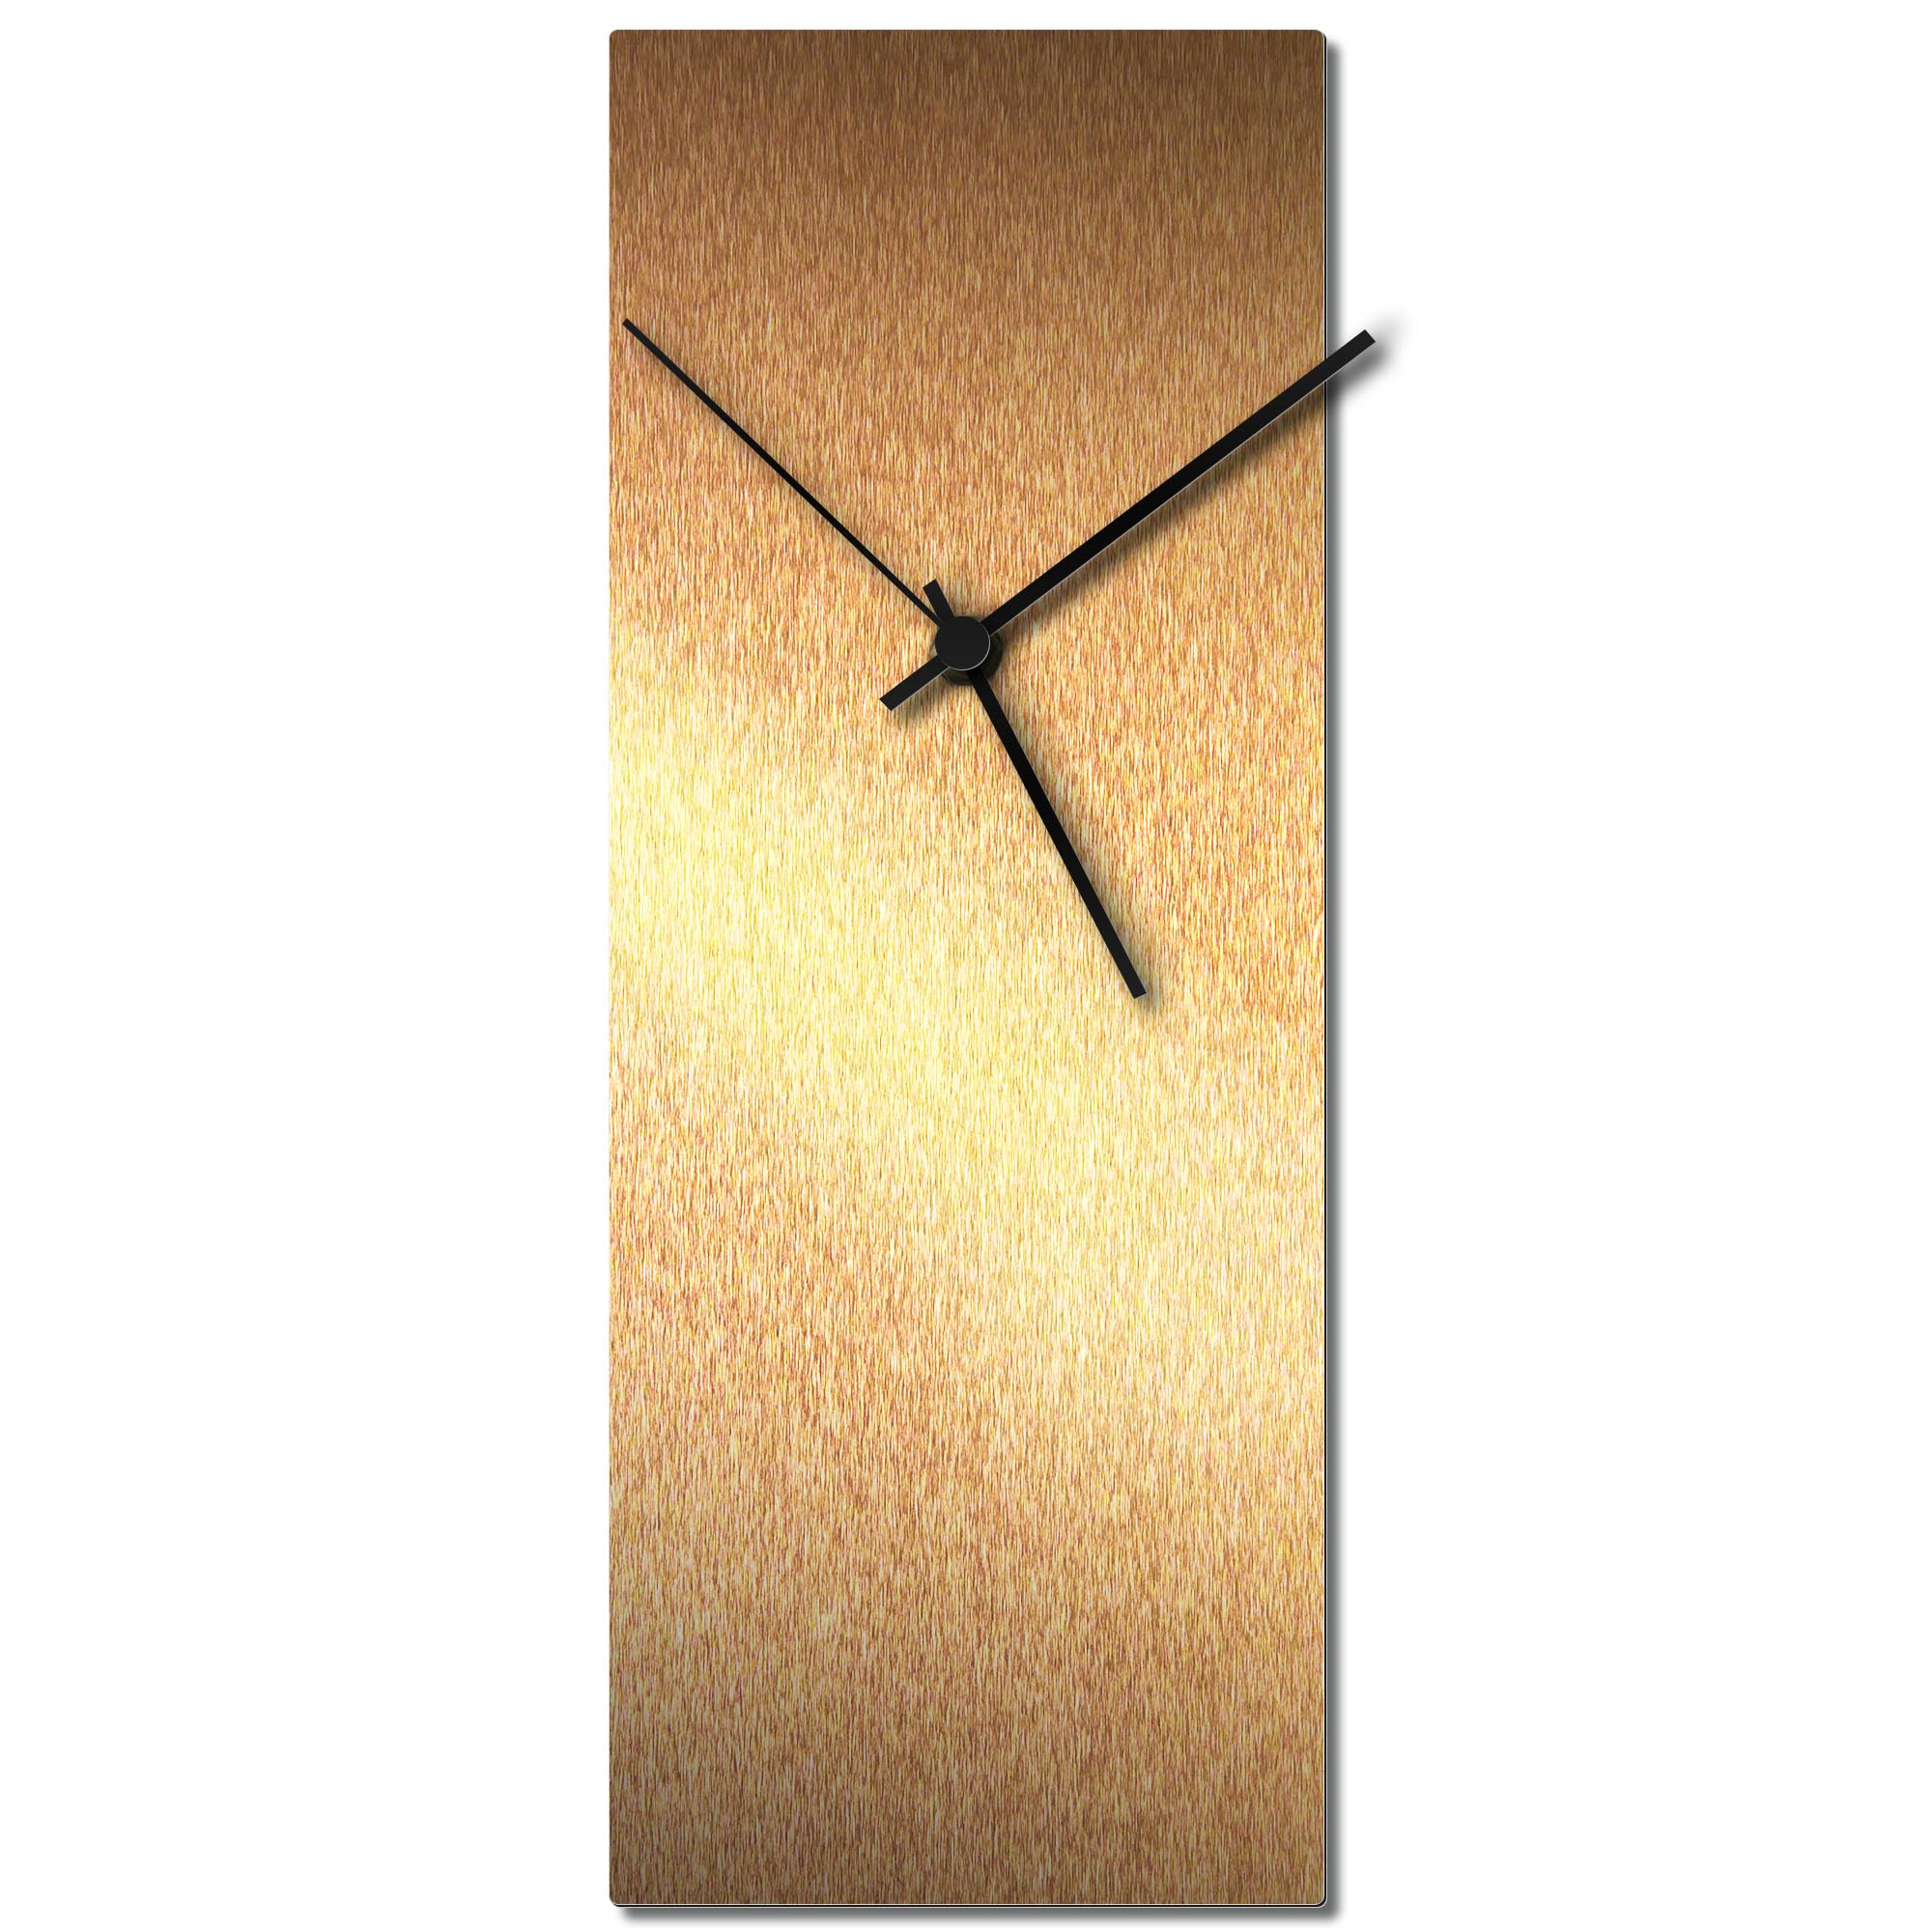 Adam Schwoeppe 'Bronzesmith Clock Black' Midcentury Modern Style Wall Clock